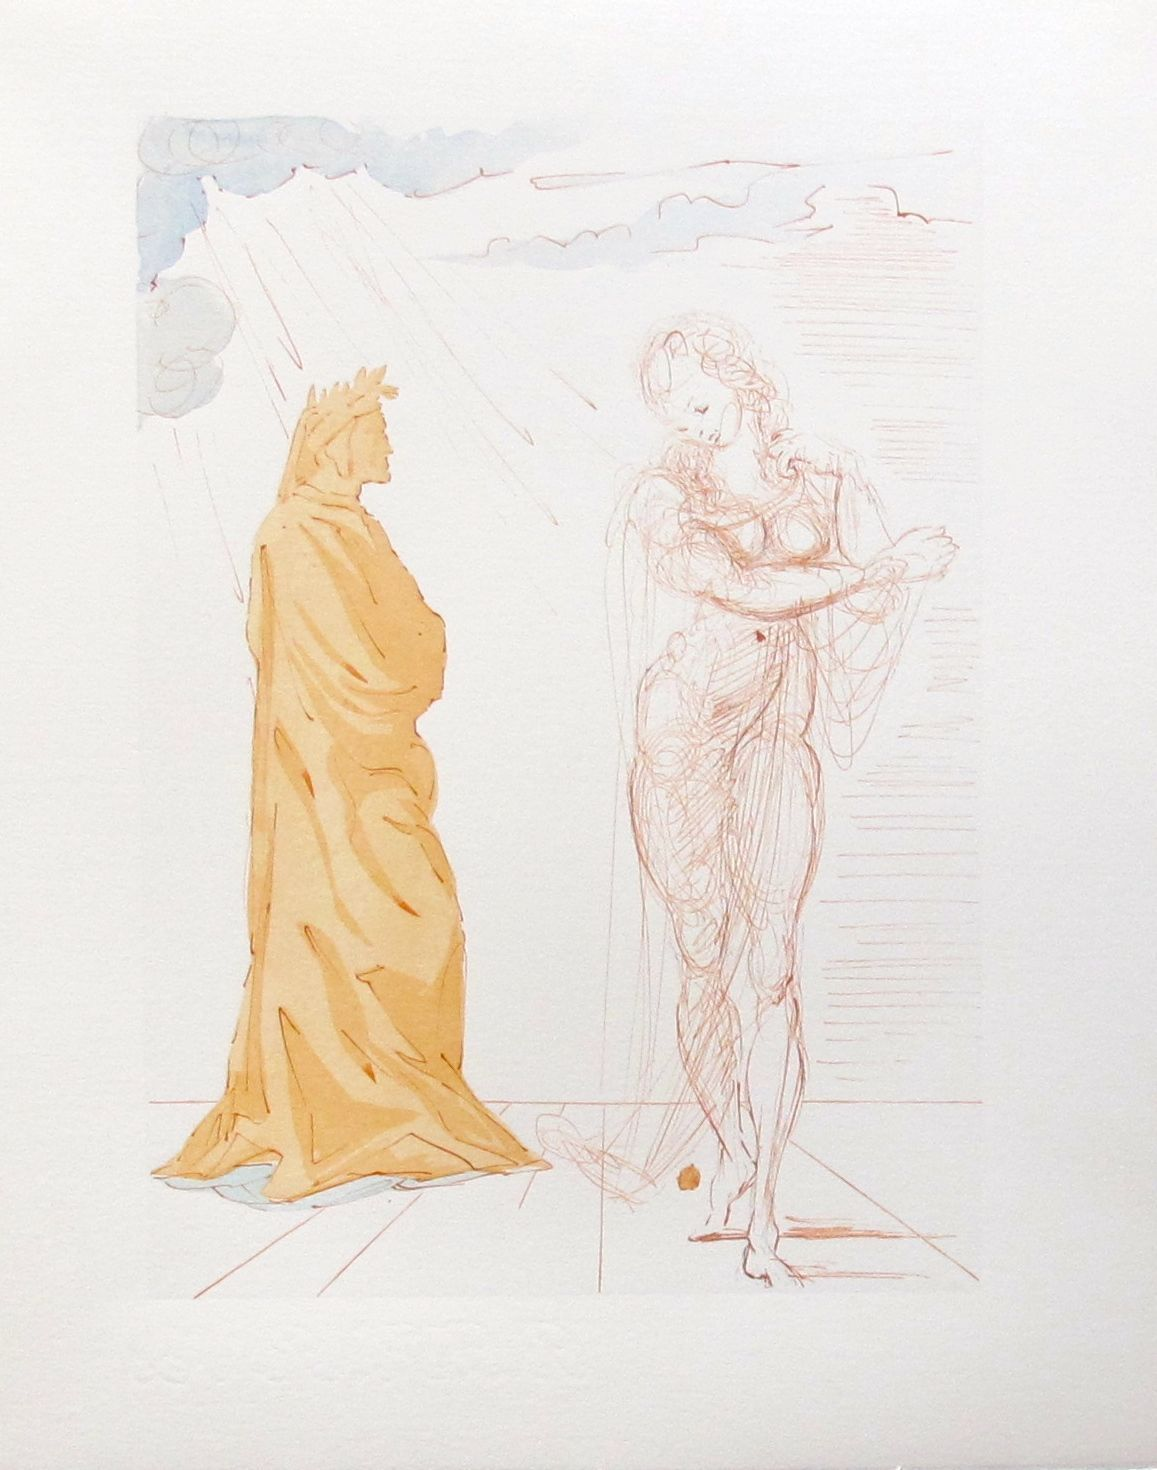 Salvador Dali 1960 DIVINE COMEDY INFERNO #2 Color Woodcut Wood Block Engraving